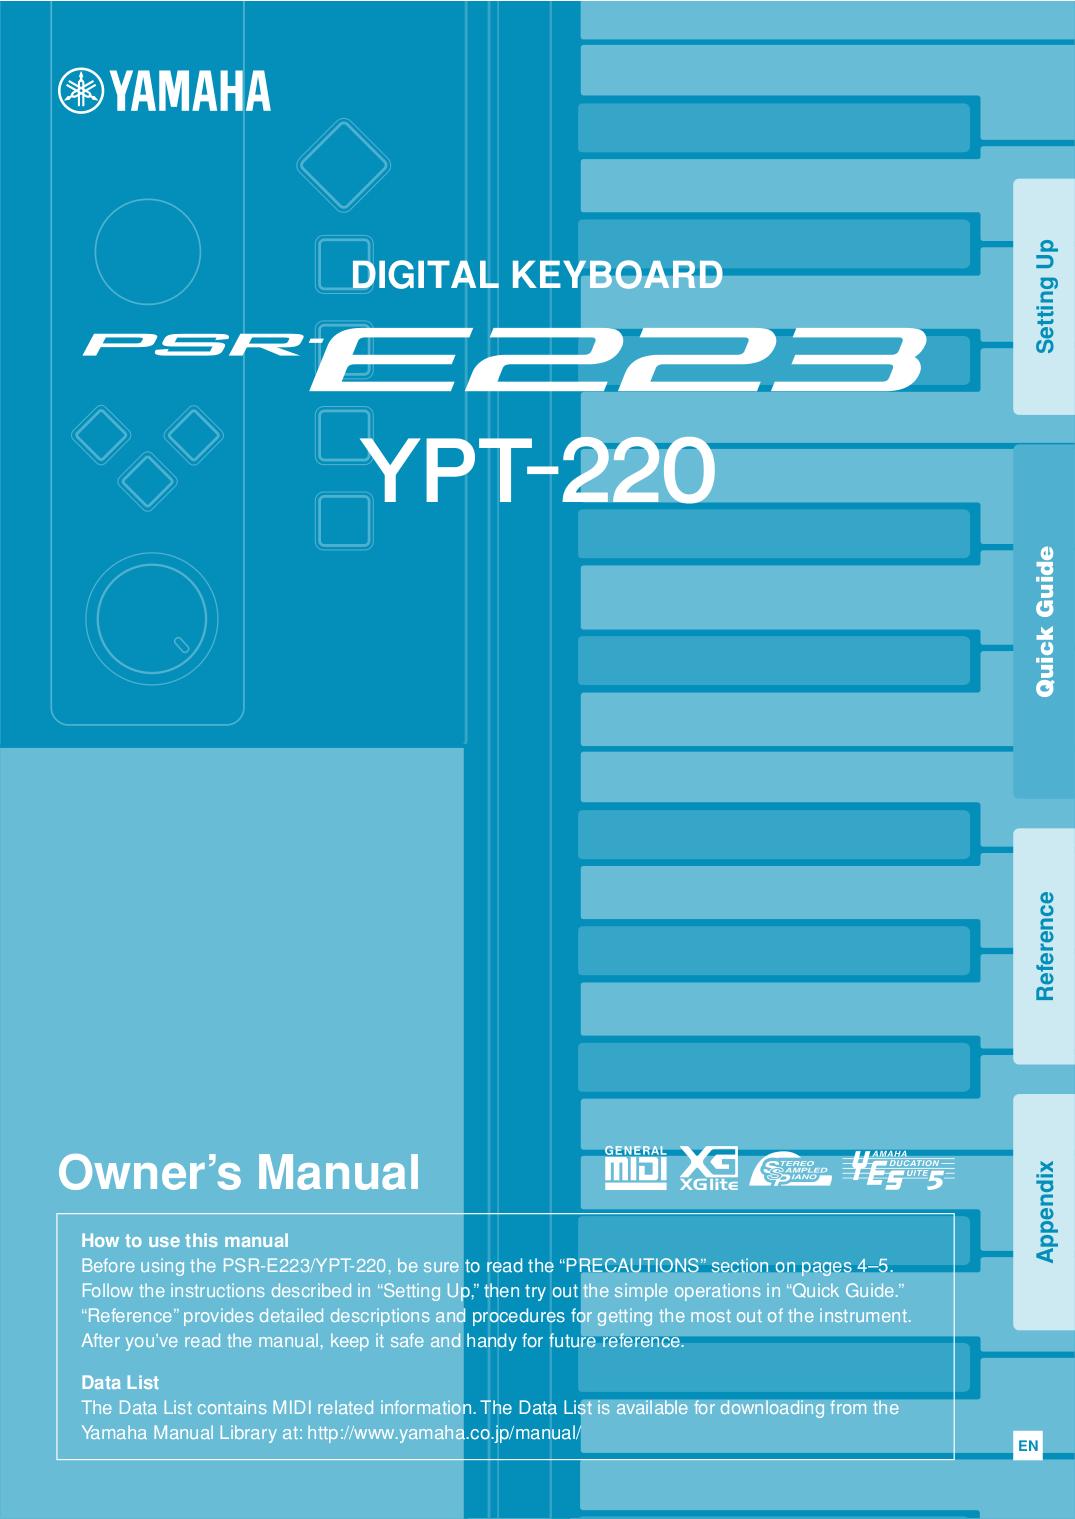 Psr-e233/ypt-230 owner's manual yamaha downloads.